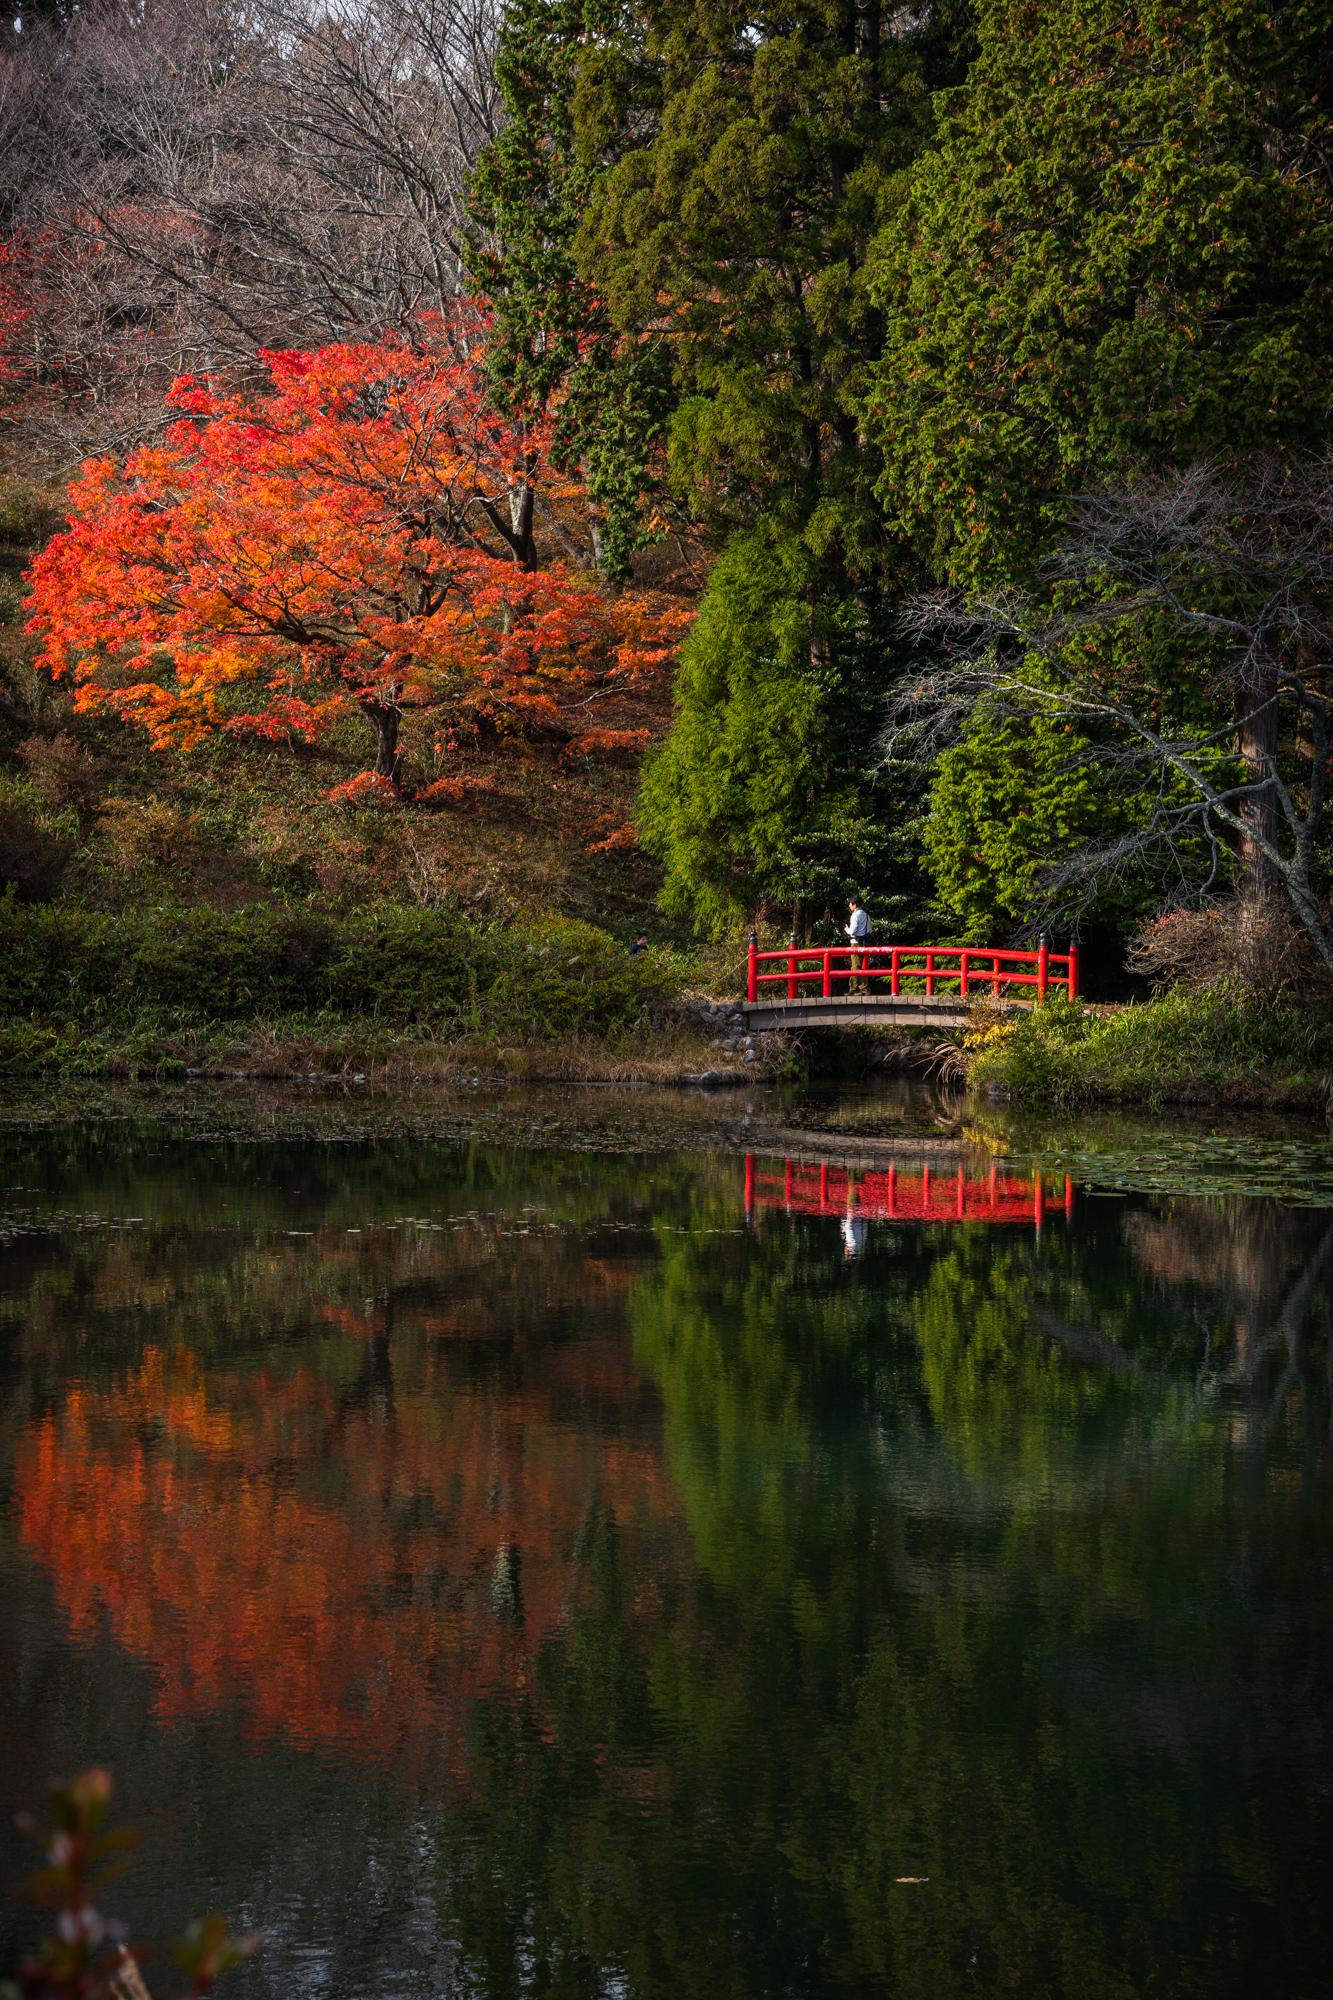 NIKON-CORPORATION_NIKON-D850_3233383602-3233490996_21877 奈良県  鳥見山公園( 秋におすすめ! 池の赤い橋が美しい紅葉のリフレクション景色! 撮影した写真の紹介、 アクセス情報や撮影ポイントなど!)